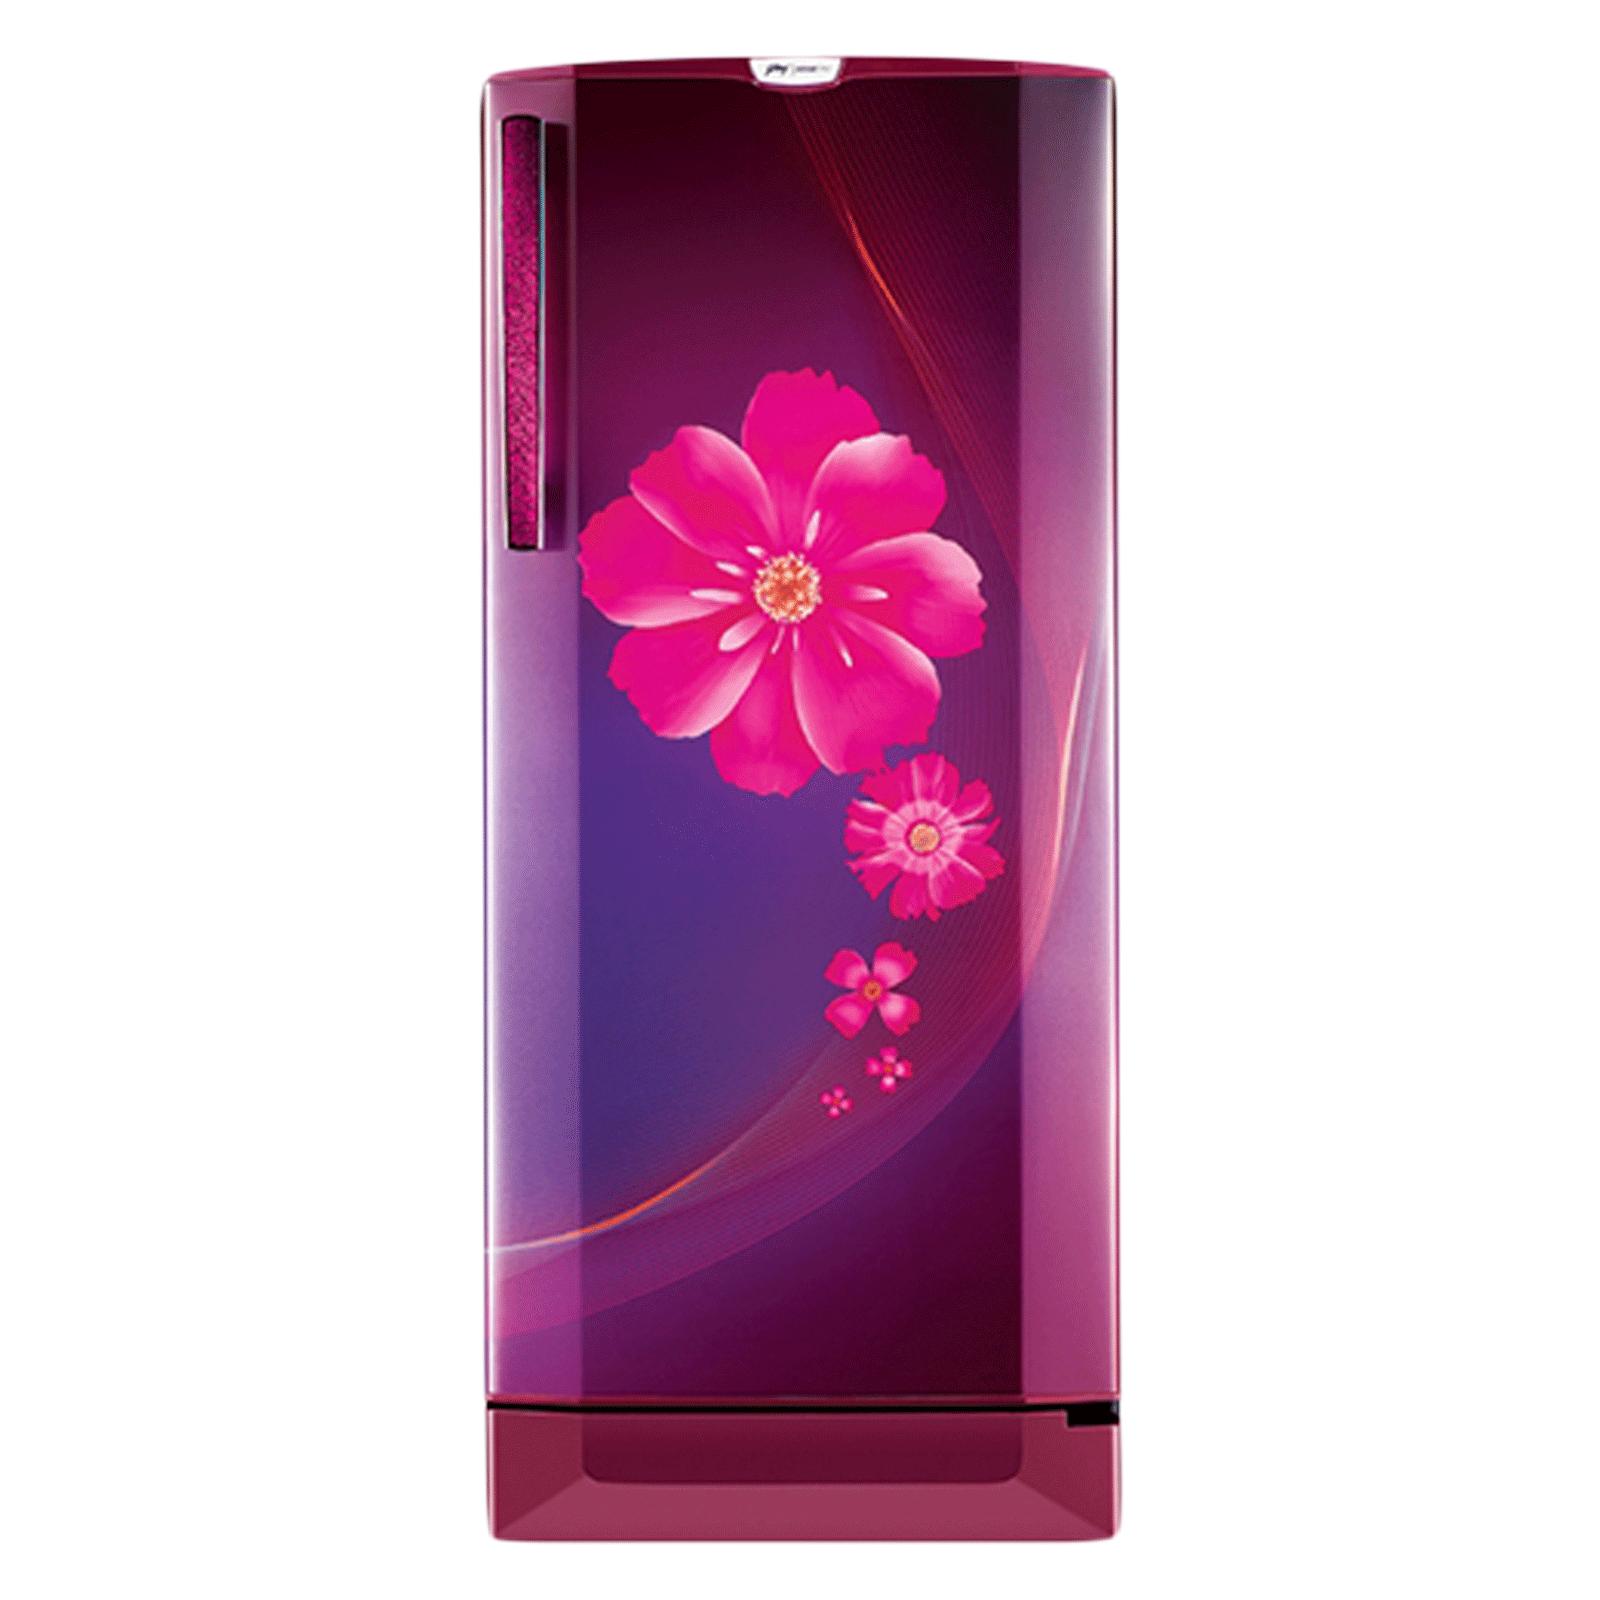 Godrej 240 Litres 3 Star Direct Cool Inverter Single Door Refrigerator (Toughened Glass Shelves, RD Edge Pro 255C 33 TAI RY WN, Ray Wine)_1